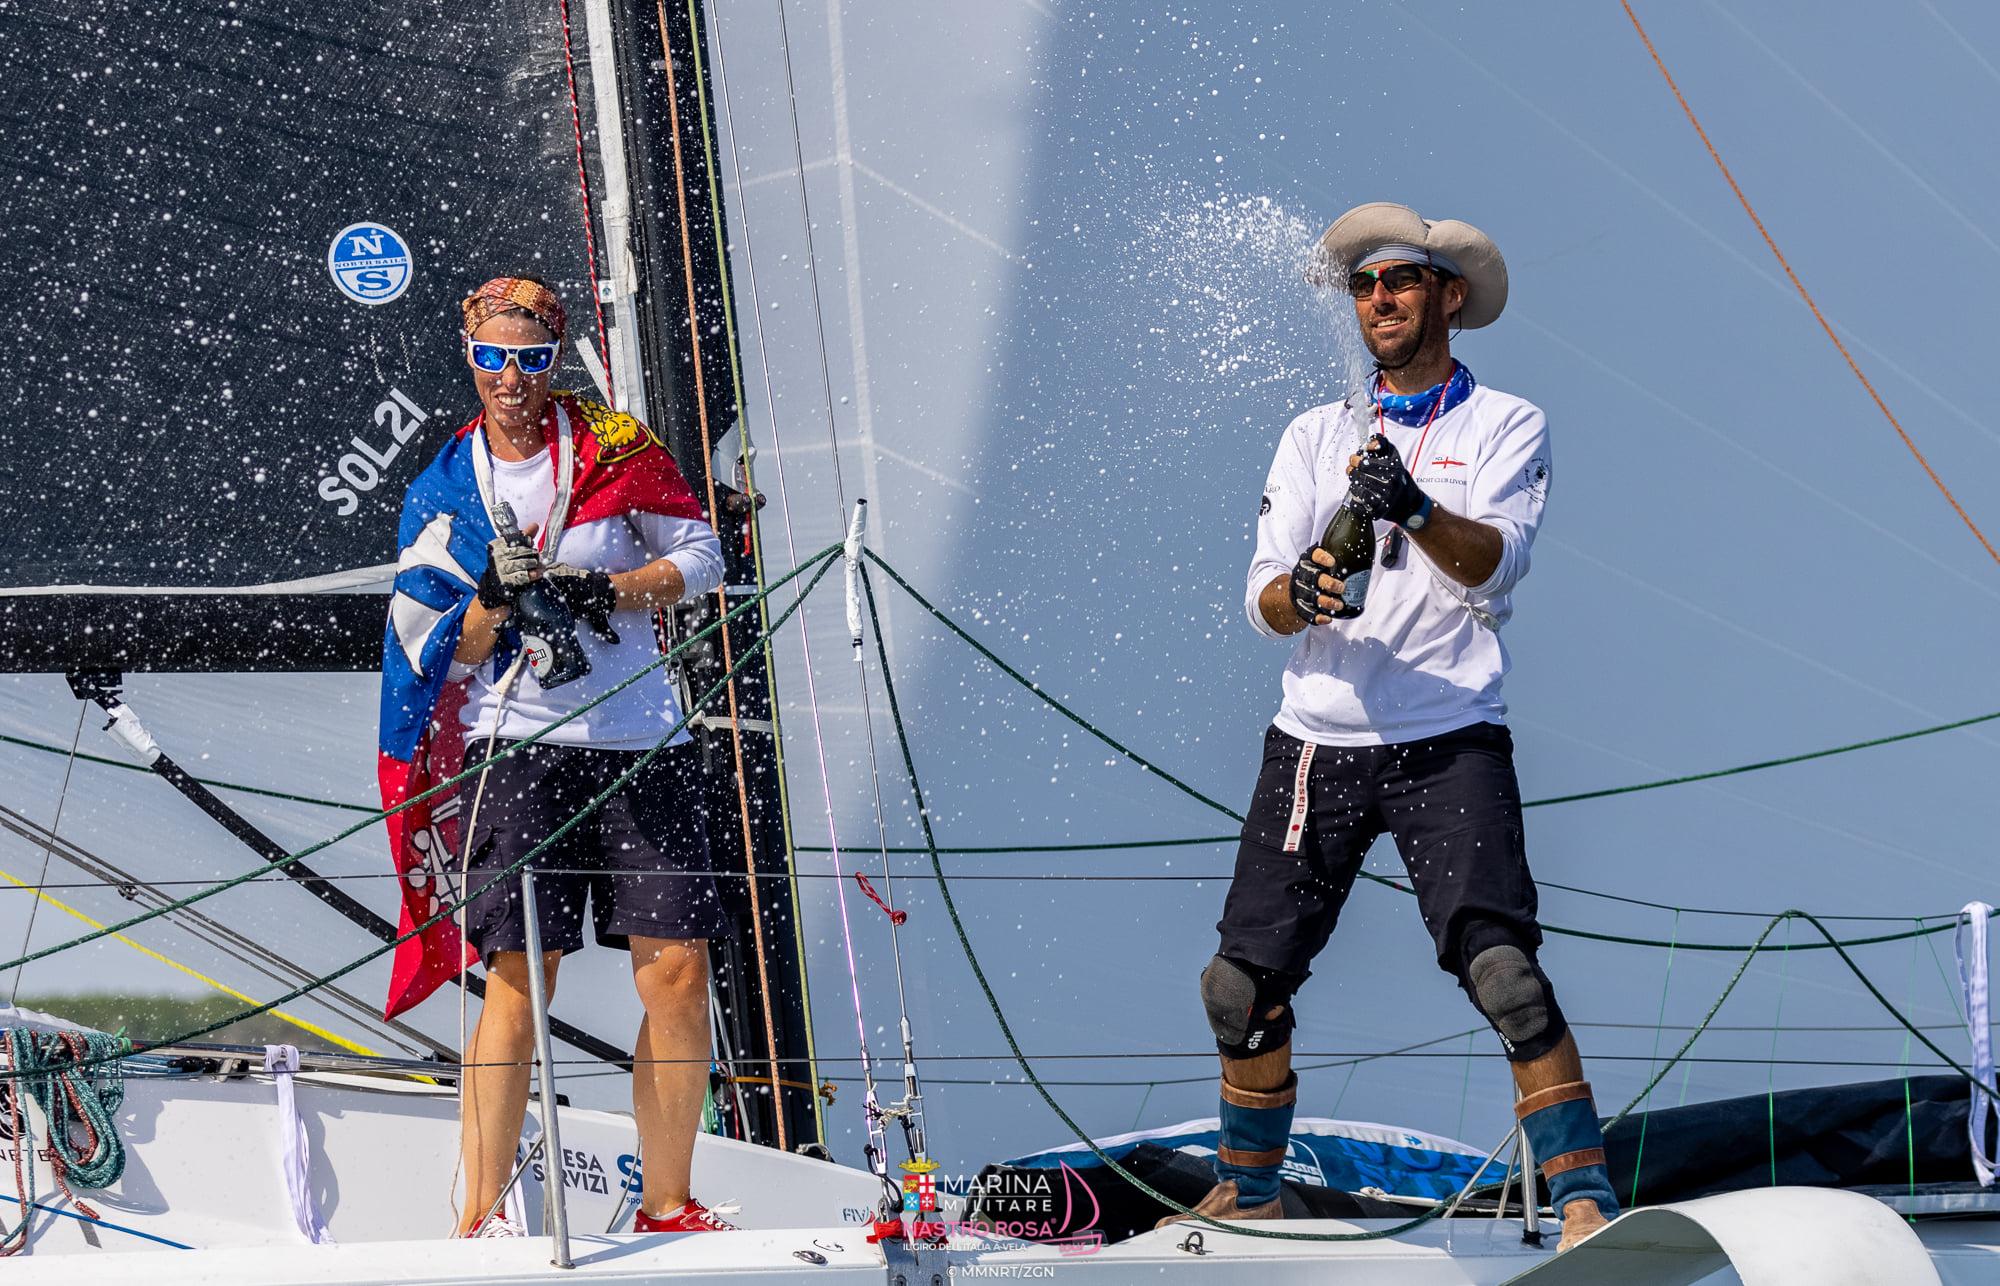 Giovanna Valsecchi & Andrea Pendibene showering champagne on their boat.